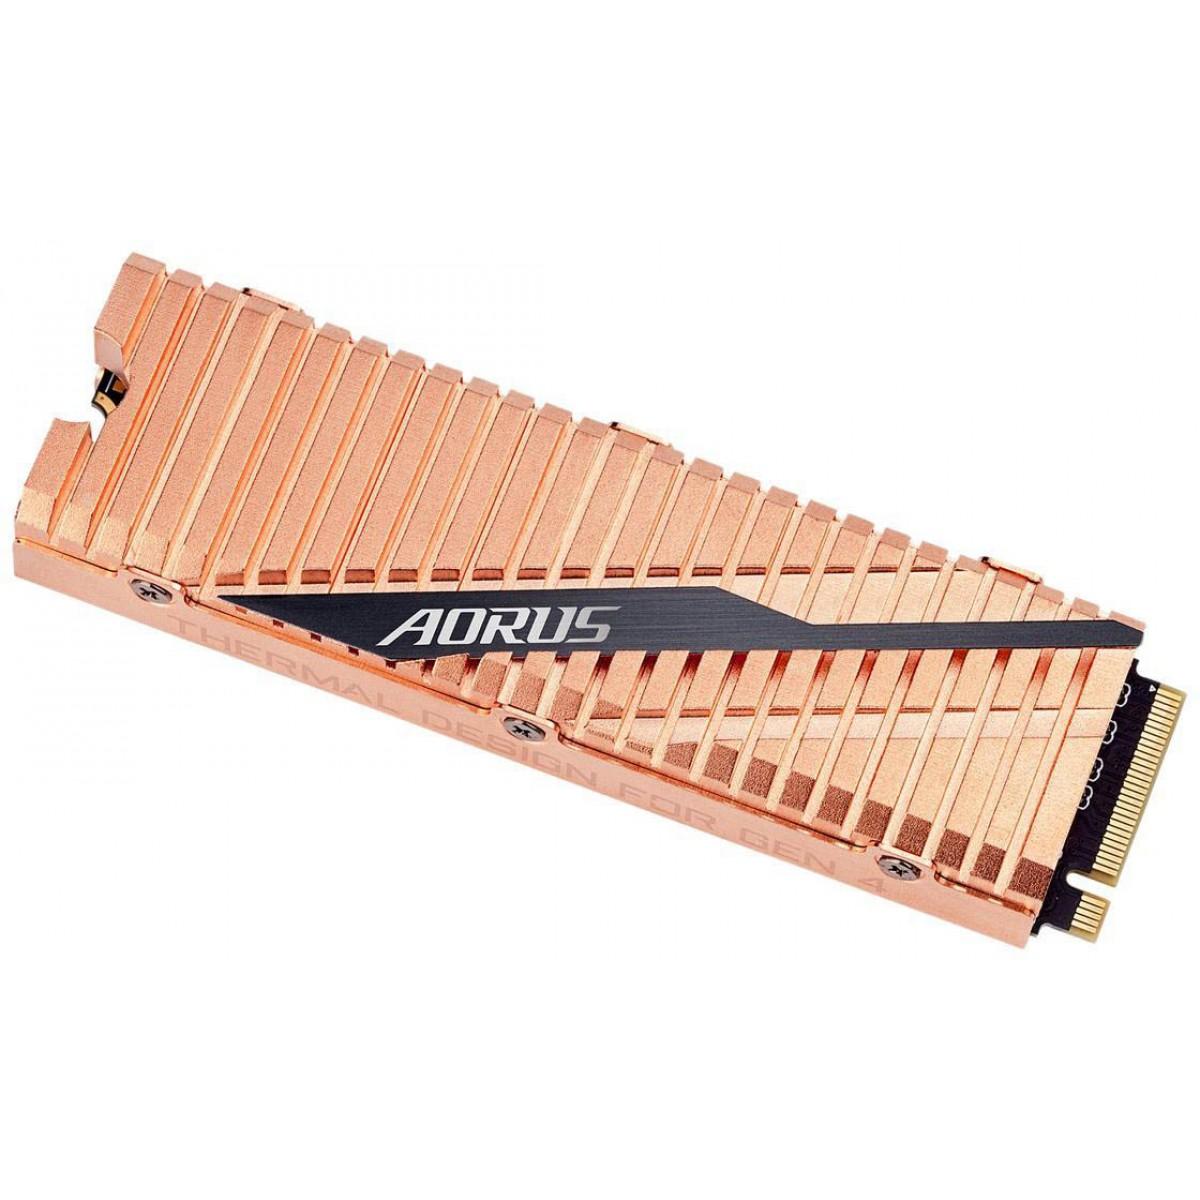 SSD Gigabyte Aorus, 500GB, M.2 2280, NVMe, Leitura 5000MBs e Gravação 2500MBs, GP-ASM2NE6500GTTD